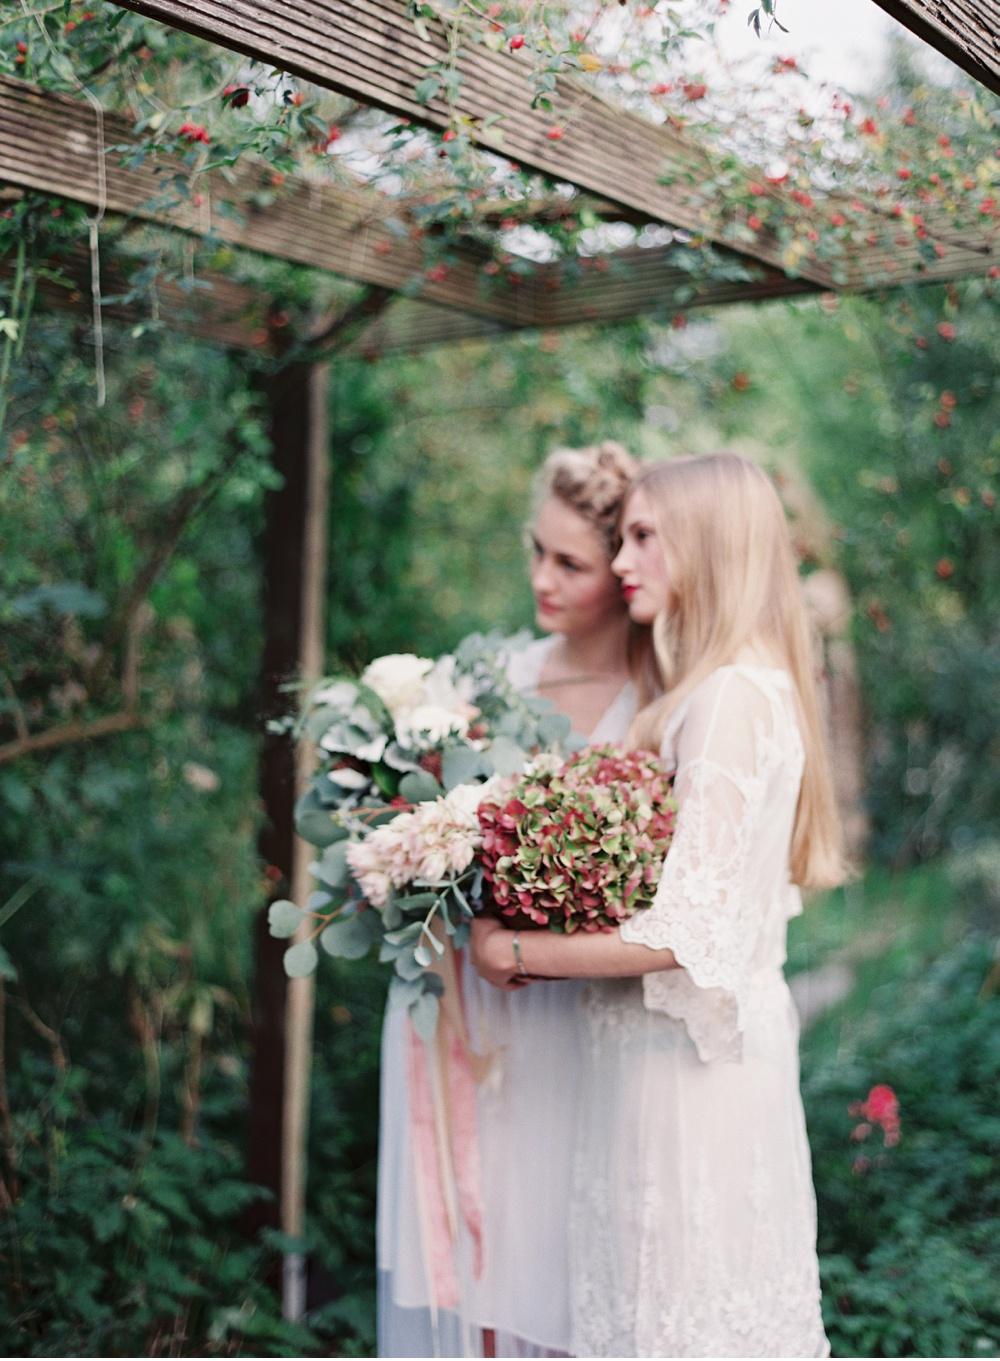 Greenhouse_wedding_inspiration©MadalinaSheldon_0022.jpg